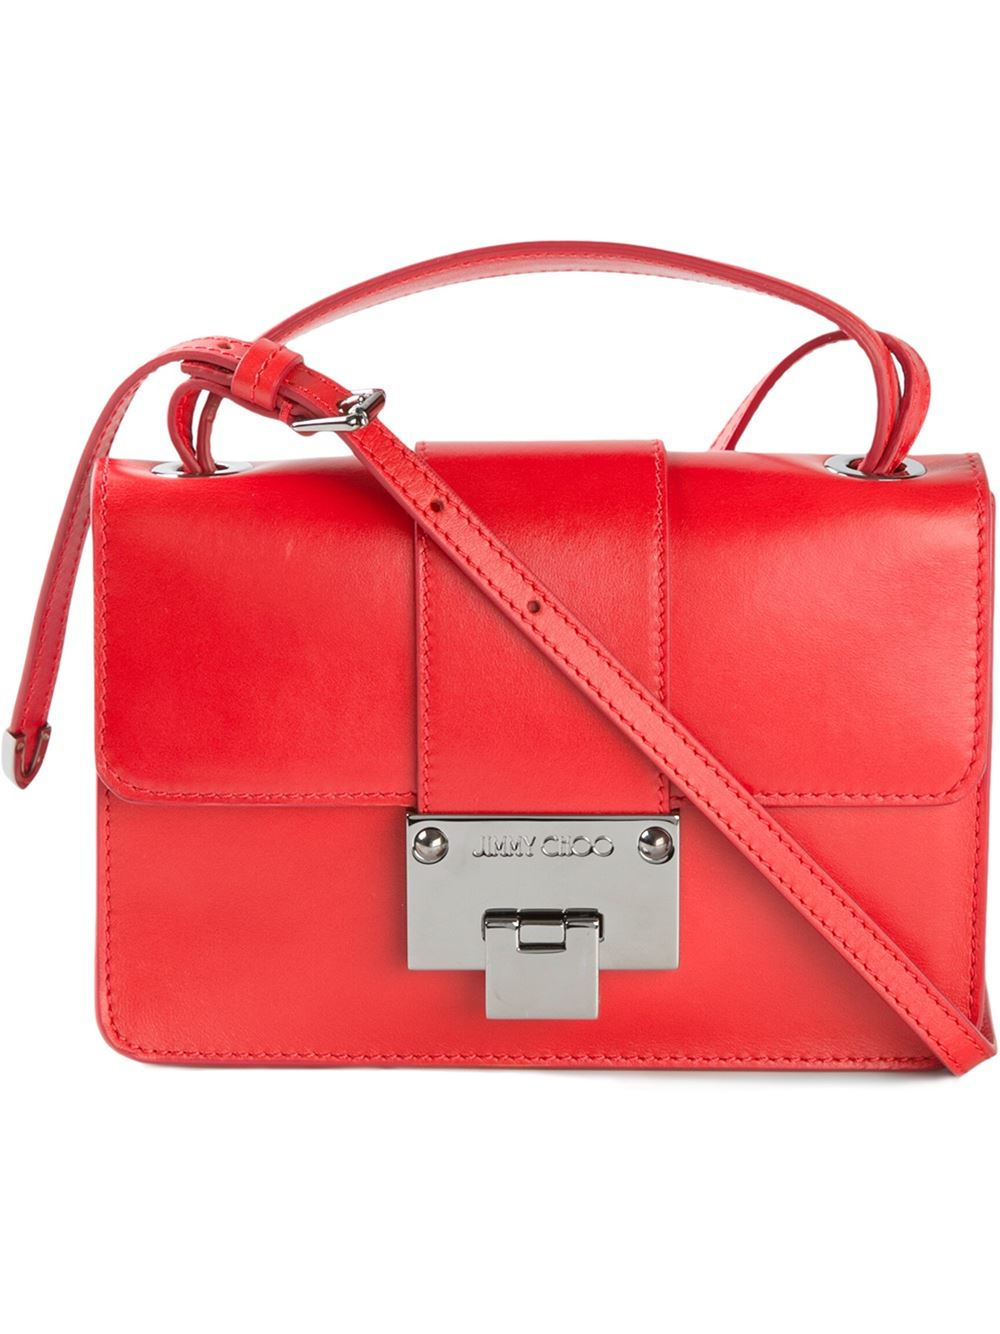 Rebel/XB crossbody bag - Red Jimmy Choo London Hv7KEDAu21